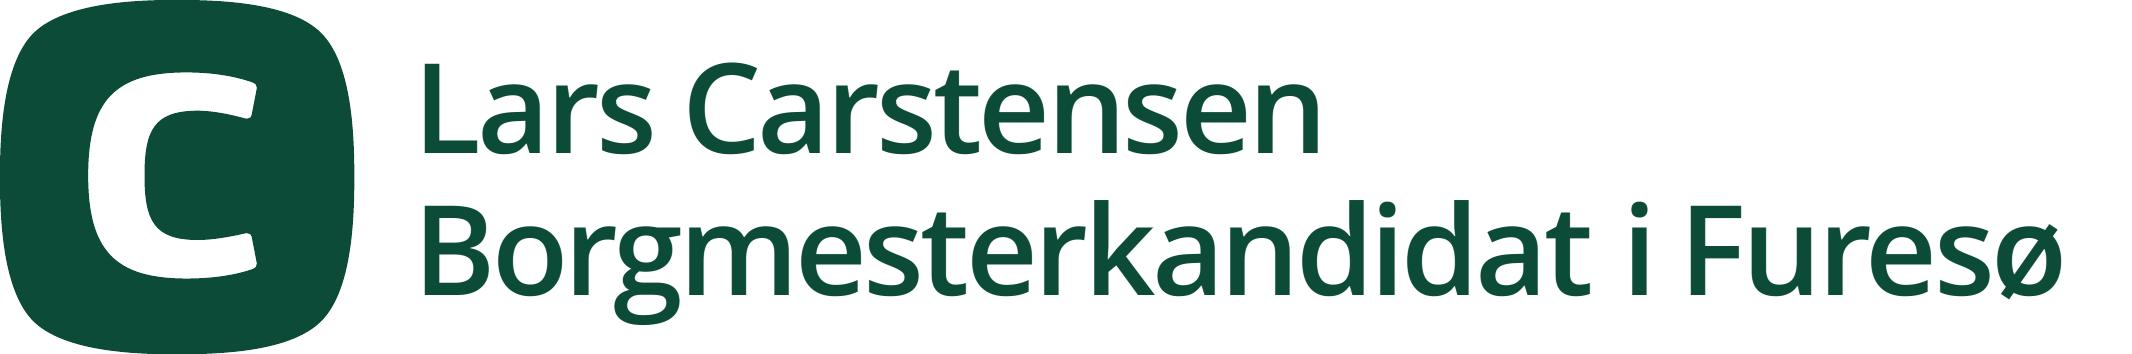 Lars Carstensen, borgmesterkandidat i Furesø